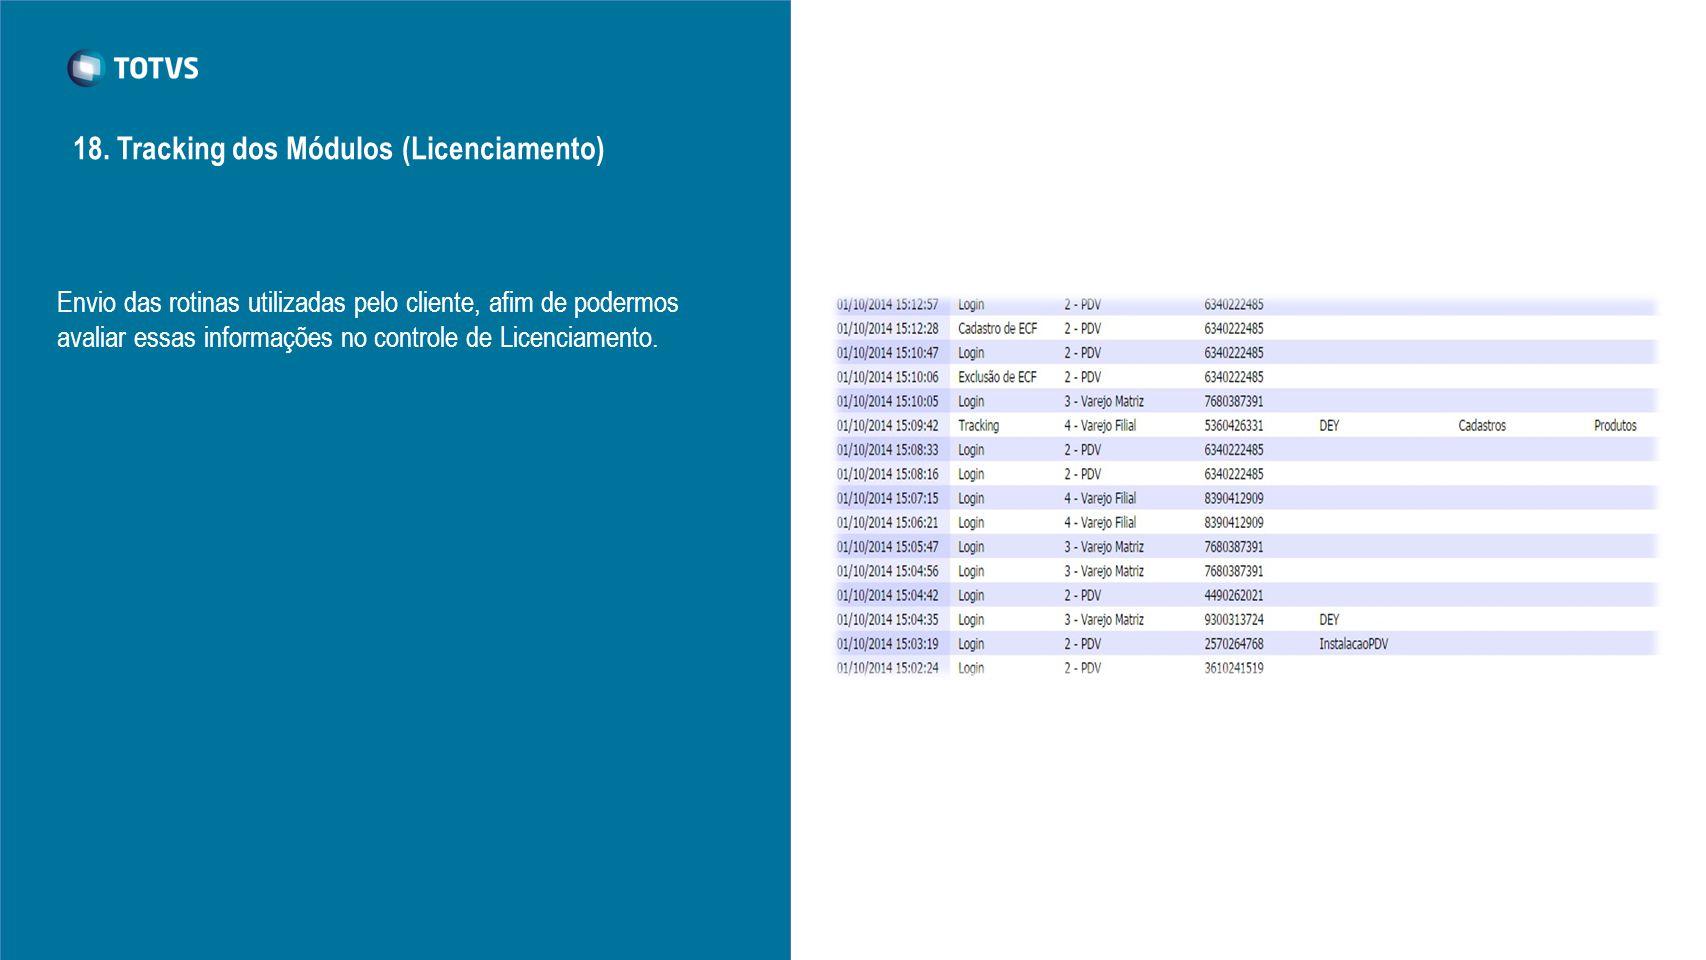 18. Tracking dos Módulos (Licenciamento)